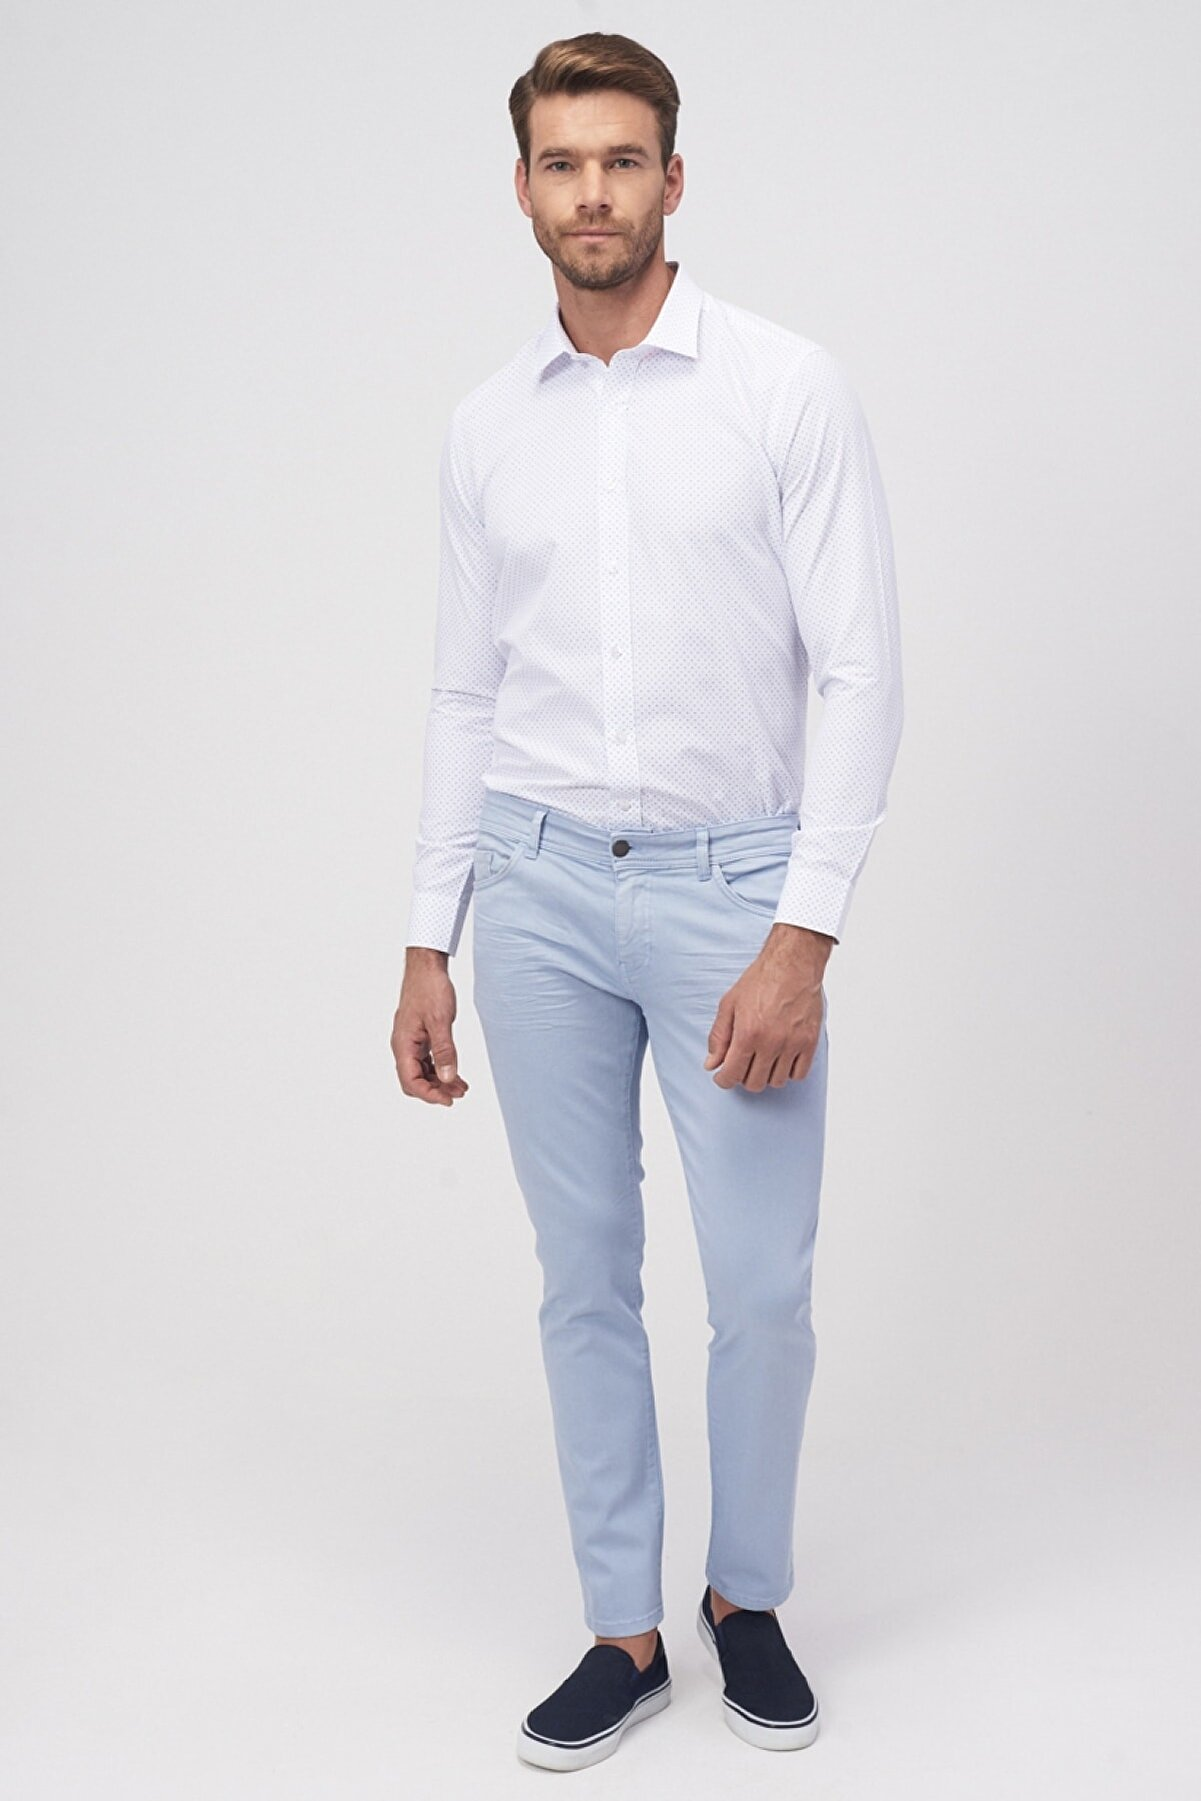 Altınyıldız Classics Erkek Mavi 360 Derece Her Yöne Esneyen Rahat Slim Fit Pantolon